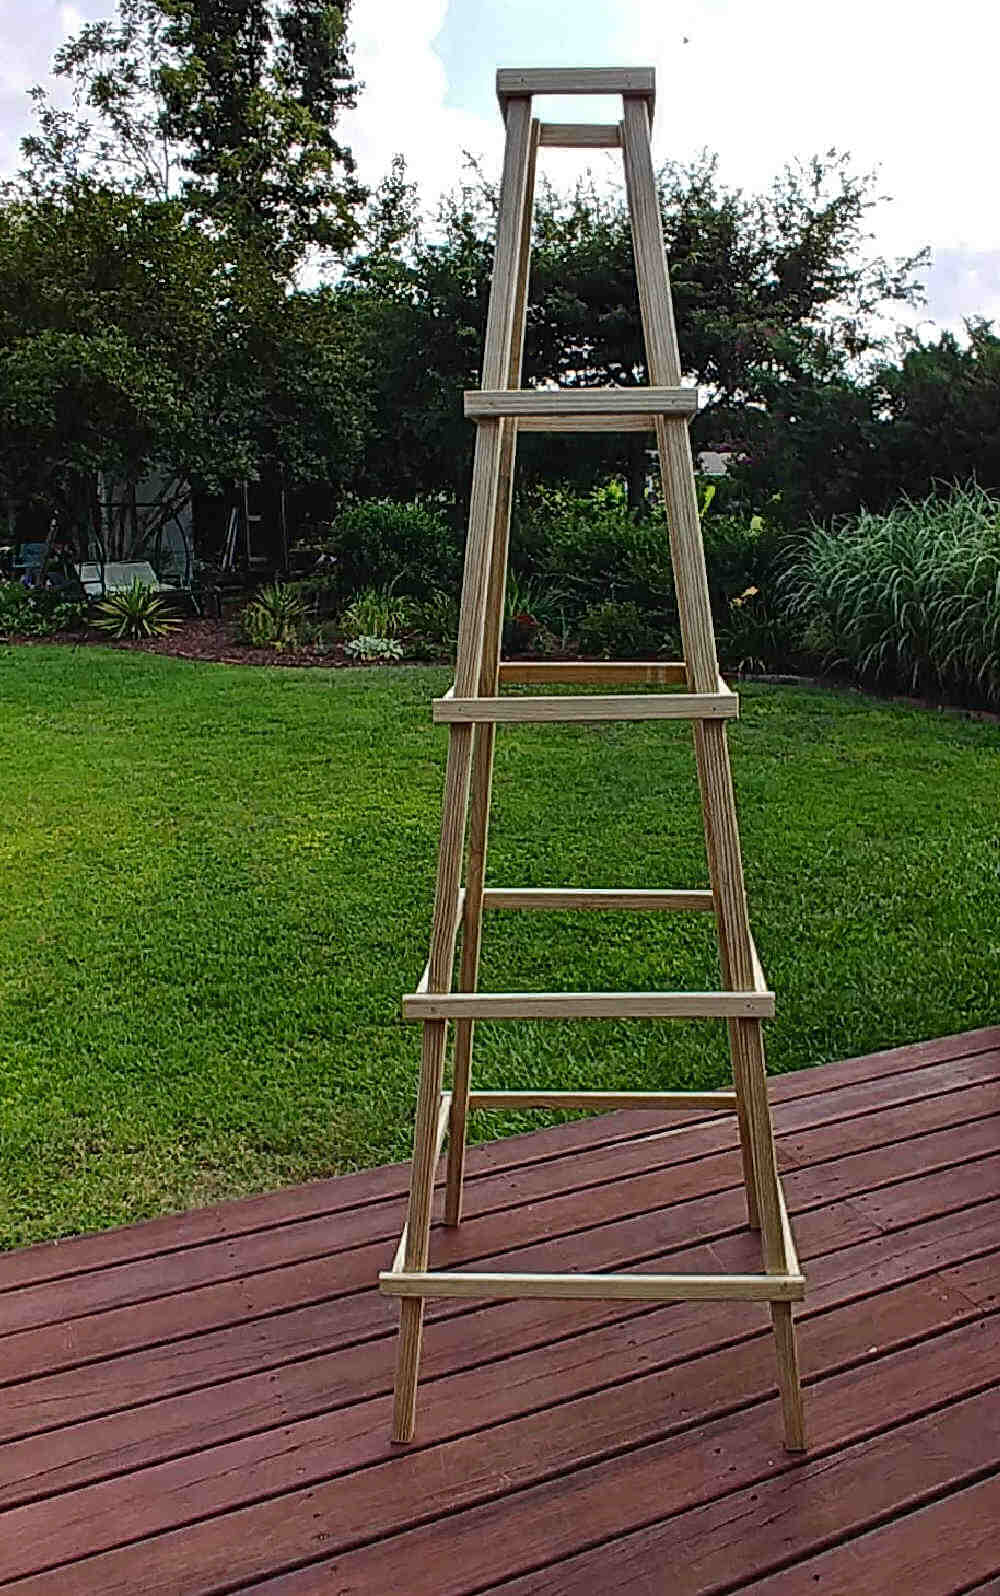 Wooden garden obelisk on a deck.